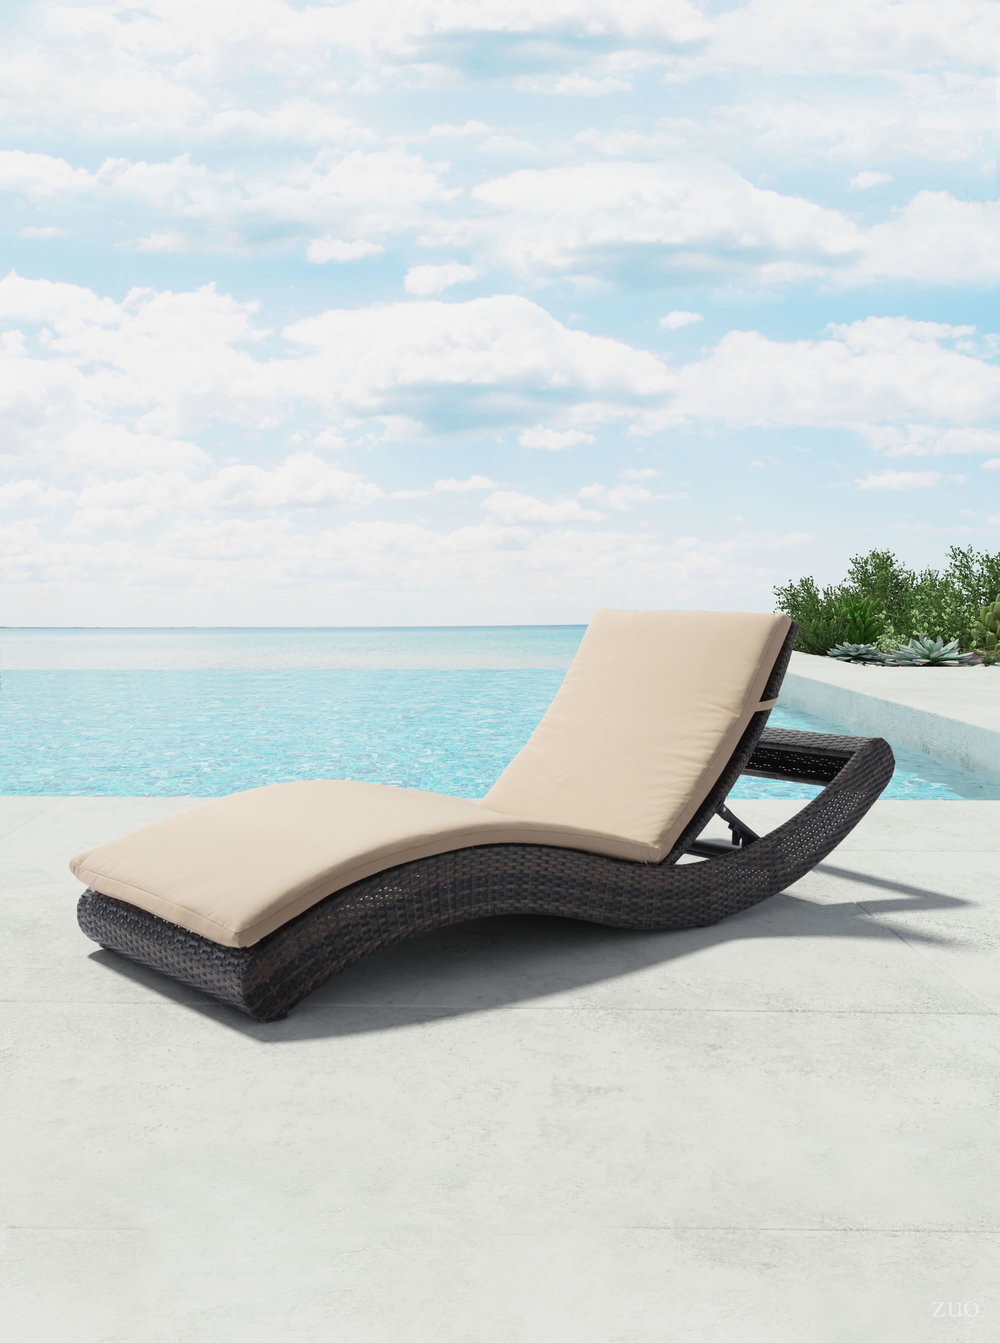 Zuo Modern Contemporary - Pamelon Beach Chaise Lounge Brown & Beige